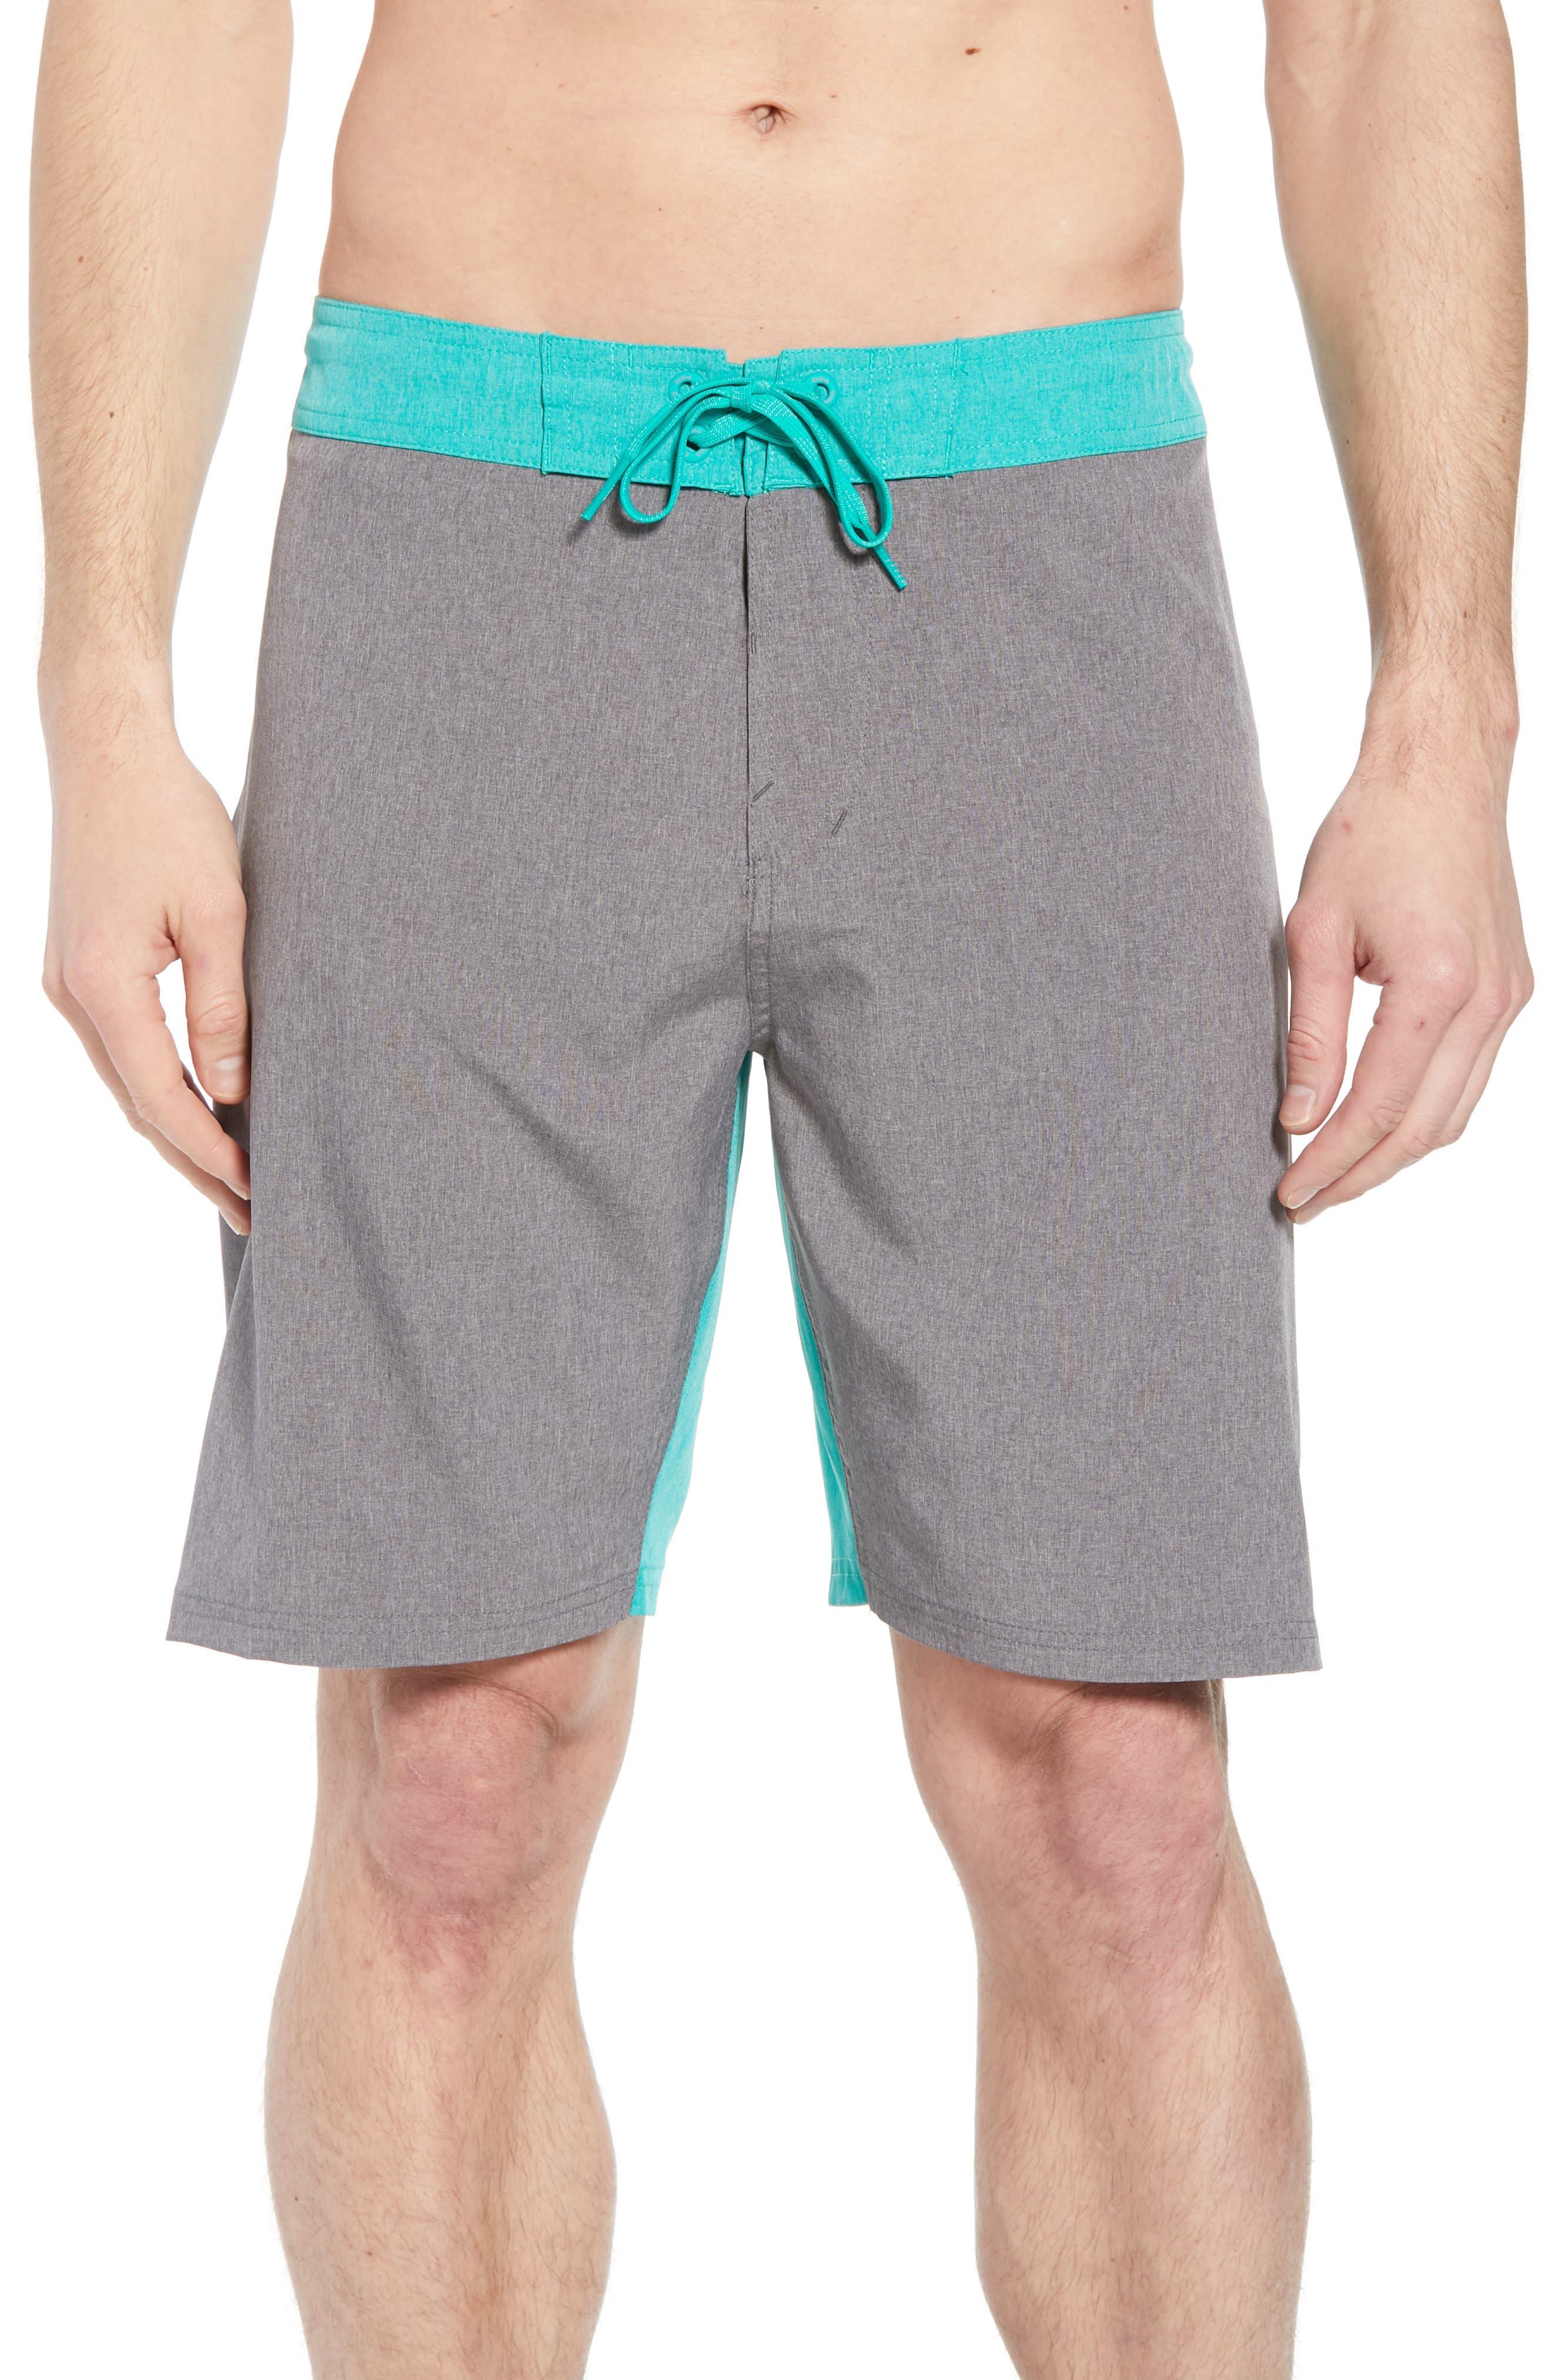 Vortex Board Shorts,                             Main thumbnail 1, color,                             Gunsmoke